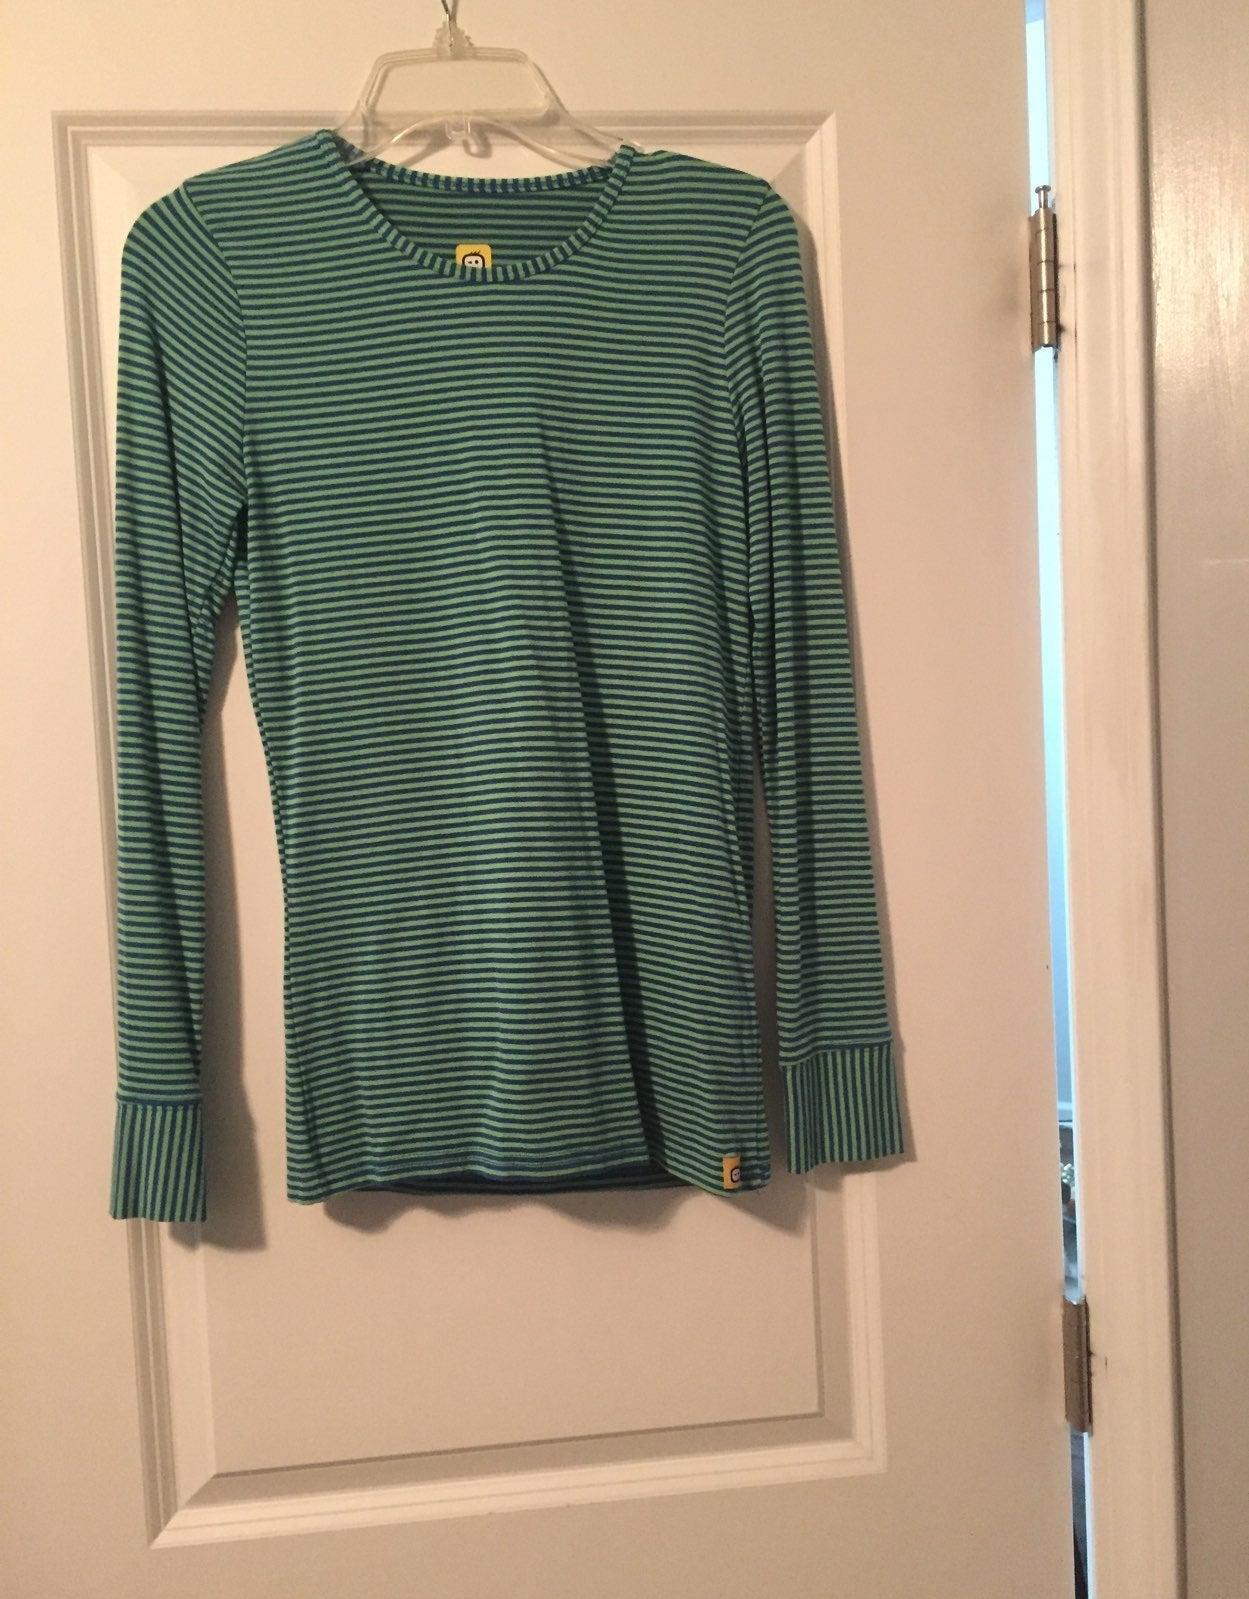 Long Sleeve wondee wink shirt size xs